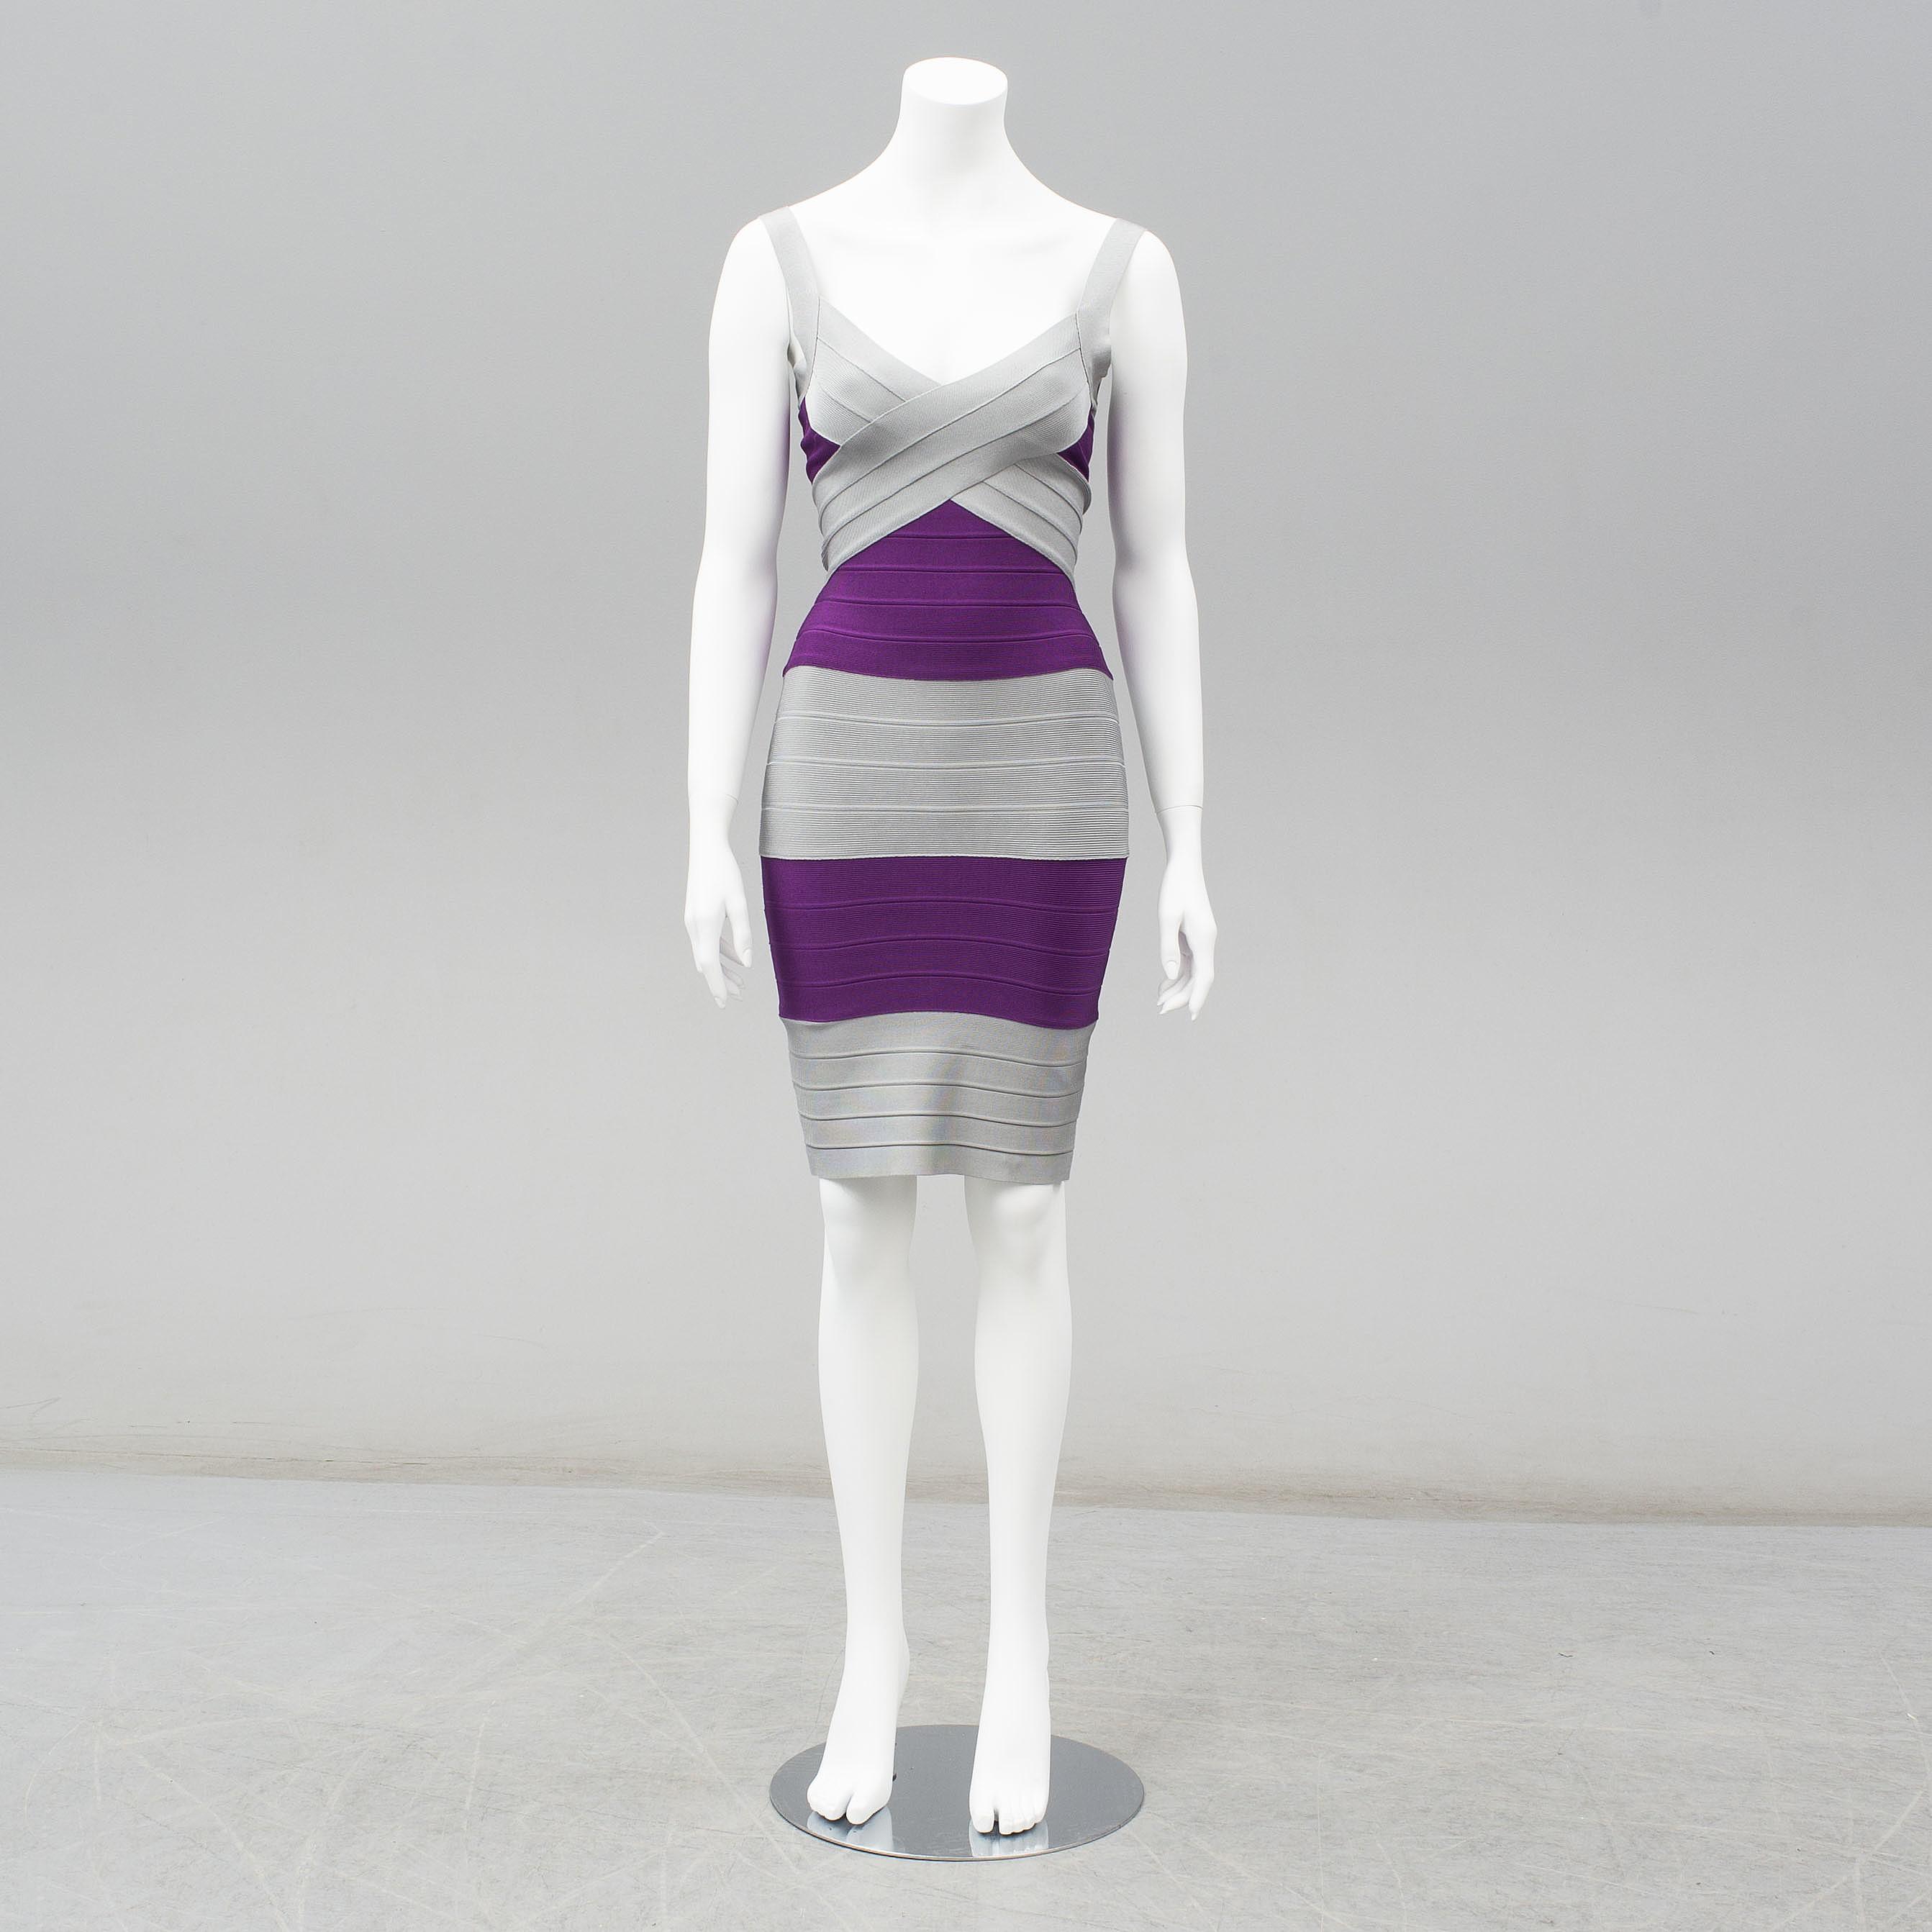 ebb91ddcb5c5 HERVE LEGER, klänning, storlek XS. - Bukowskis